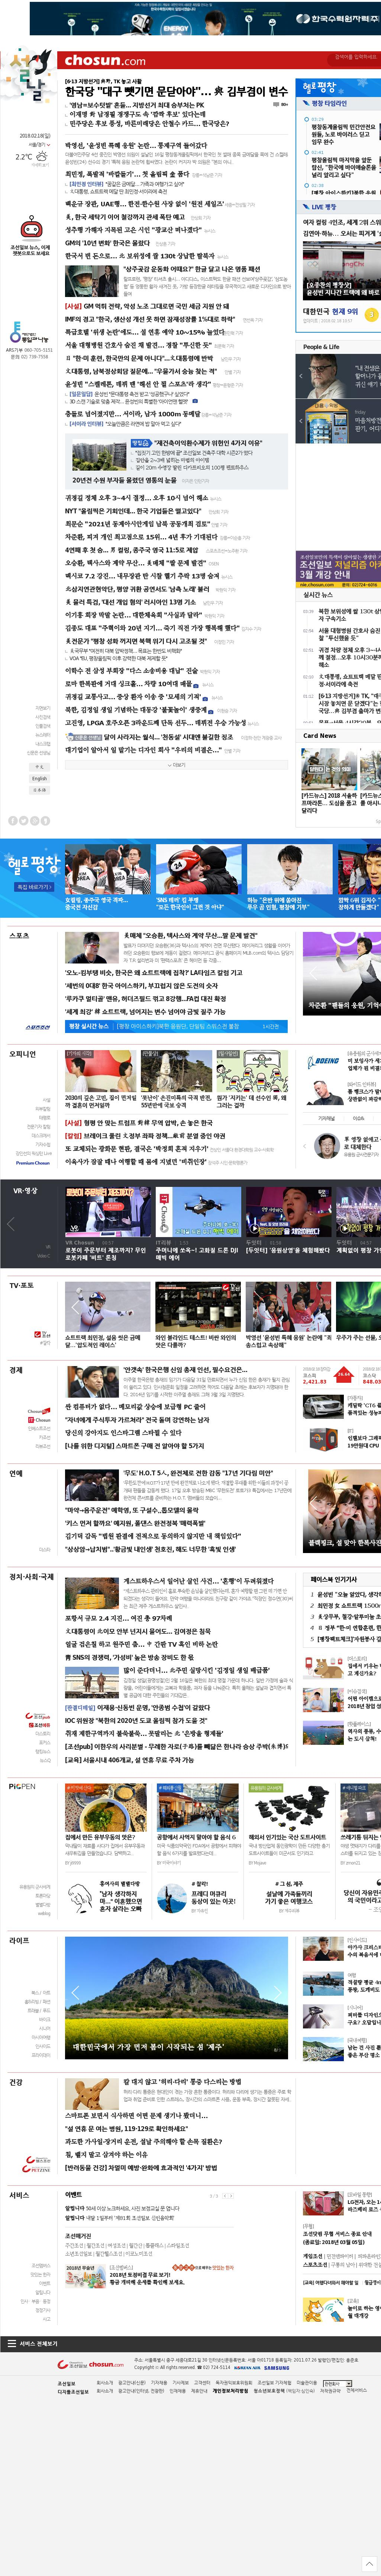 chosun.com at Sunday Feb. 18, 2018, 4:01 a.m. UTC